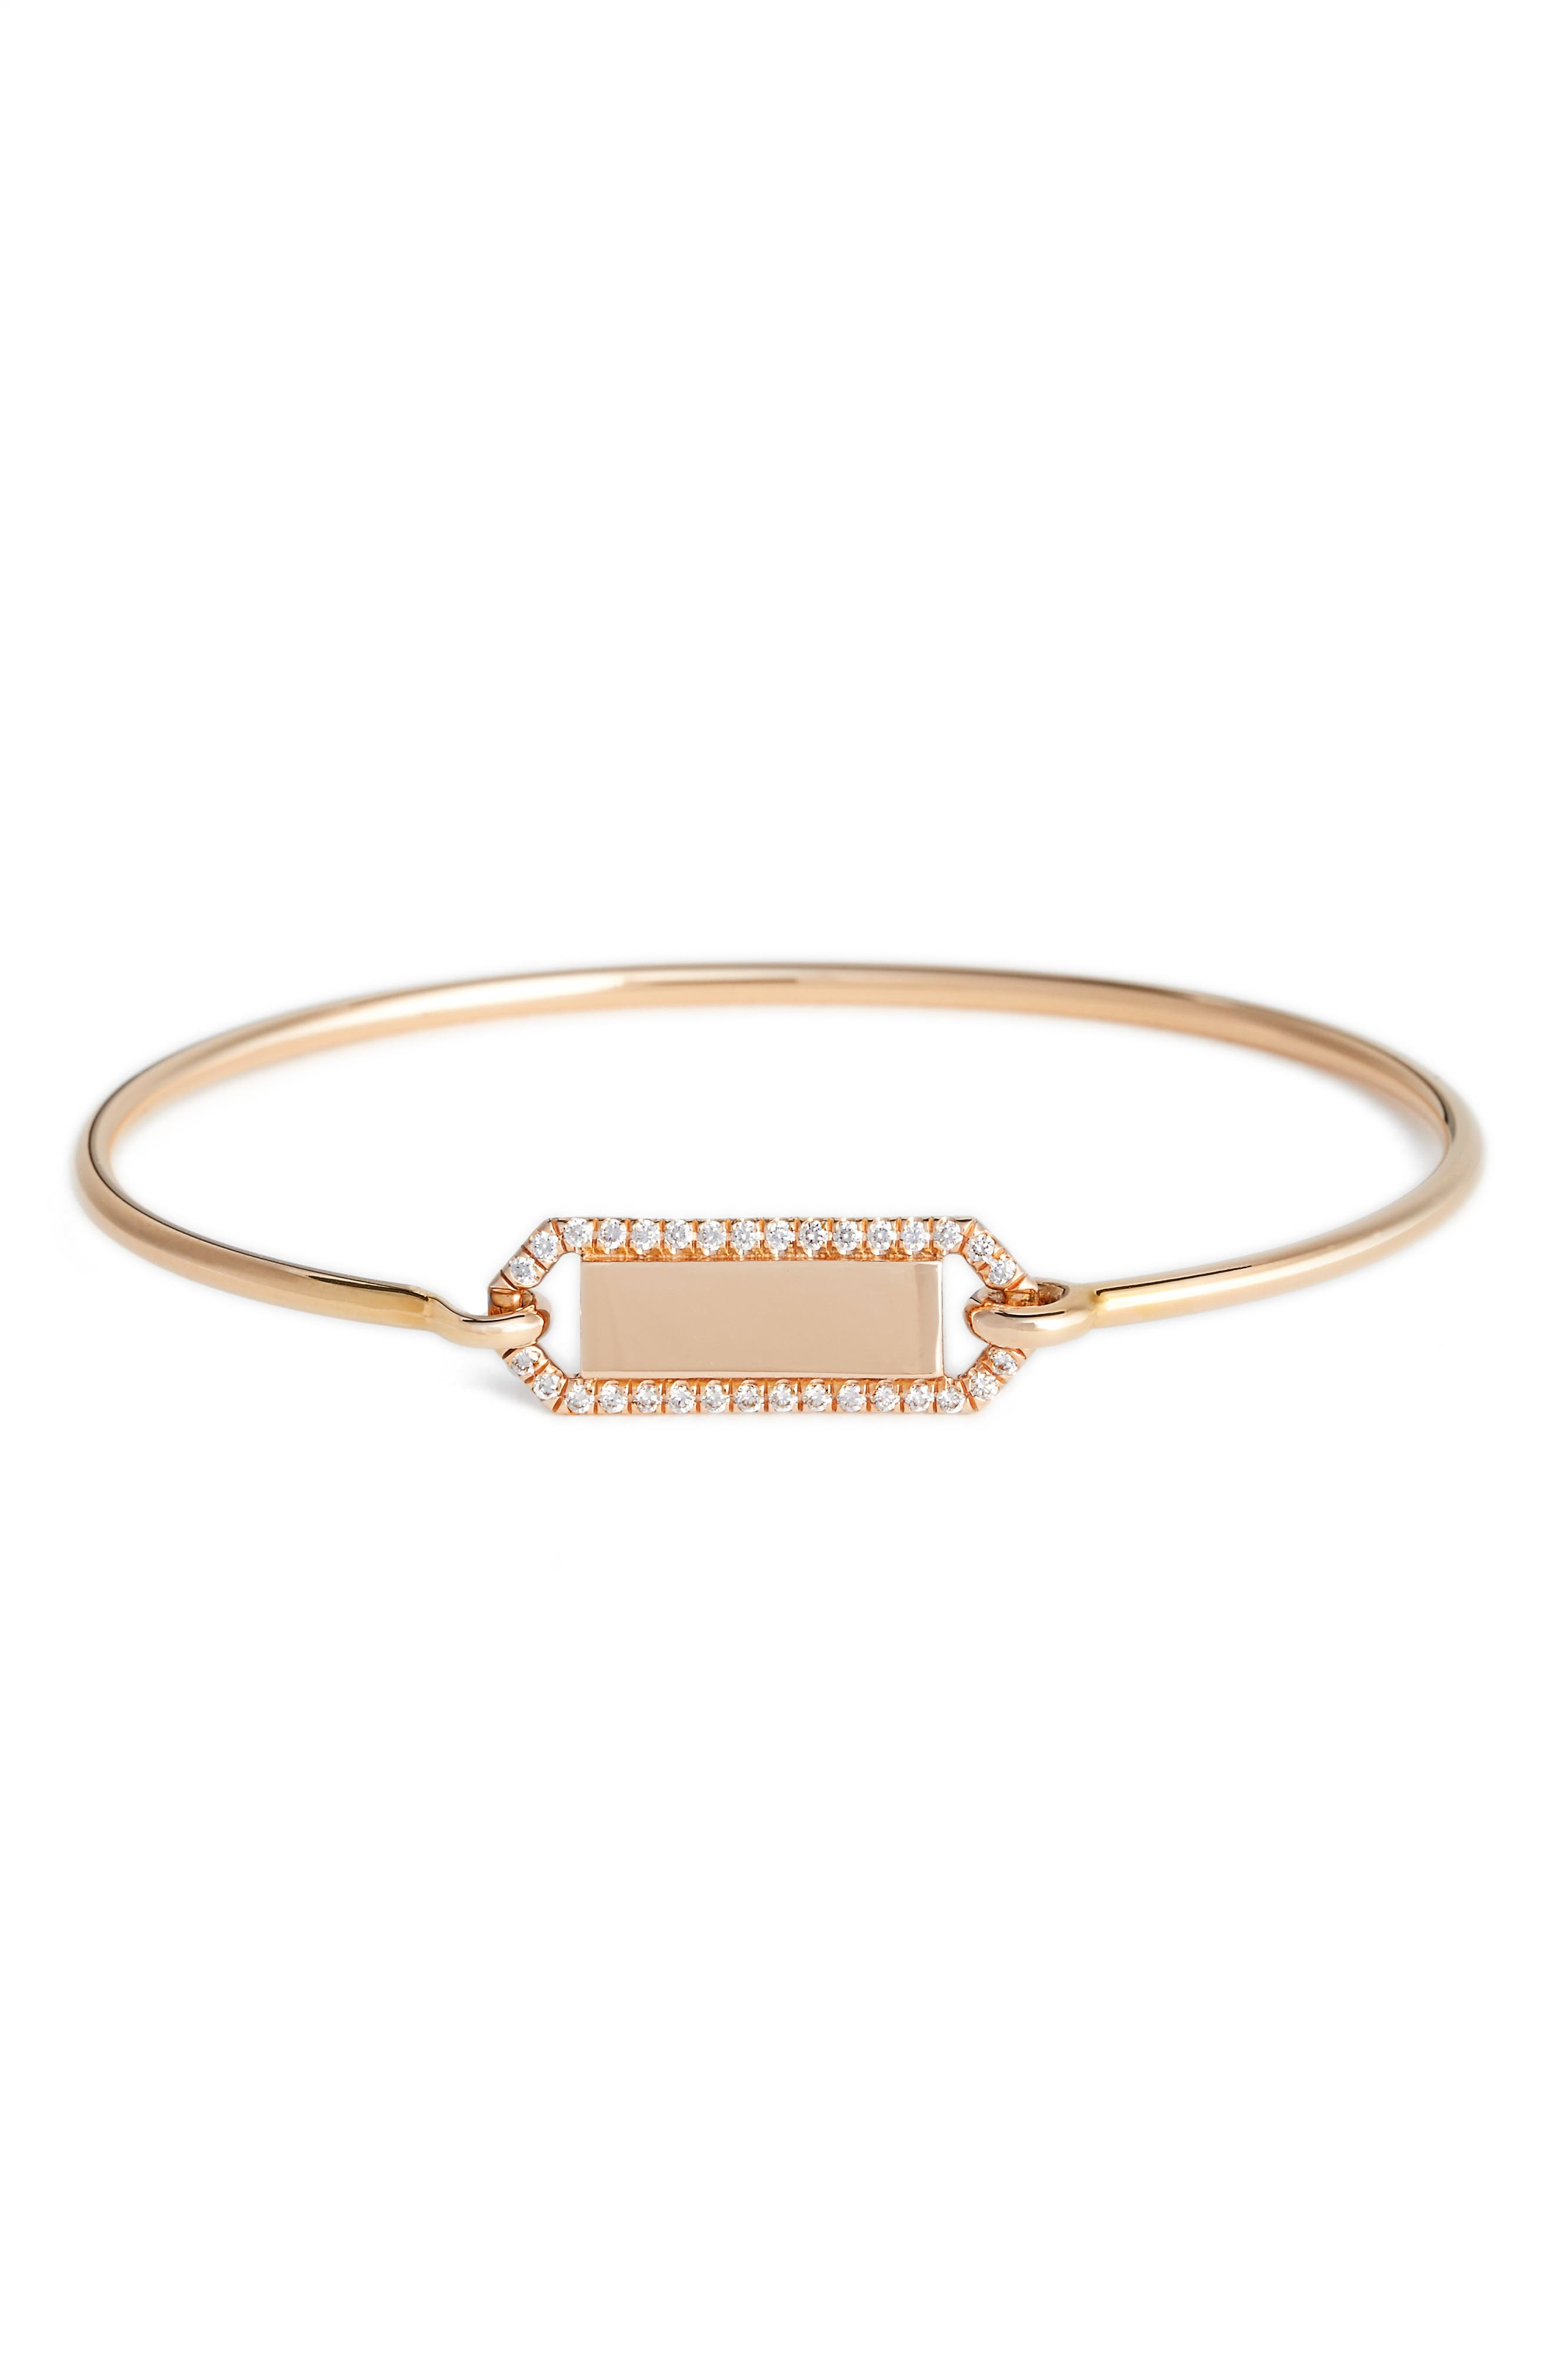 Personalized Diamond & Rose Gold Bangle,                             Main thumbnail 1, color,                             Diamond